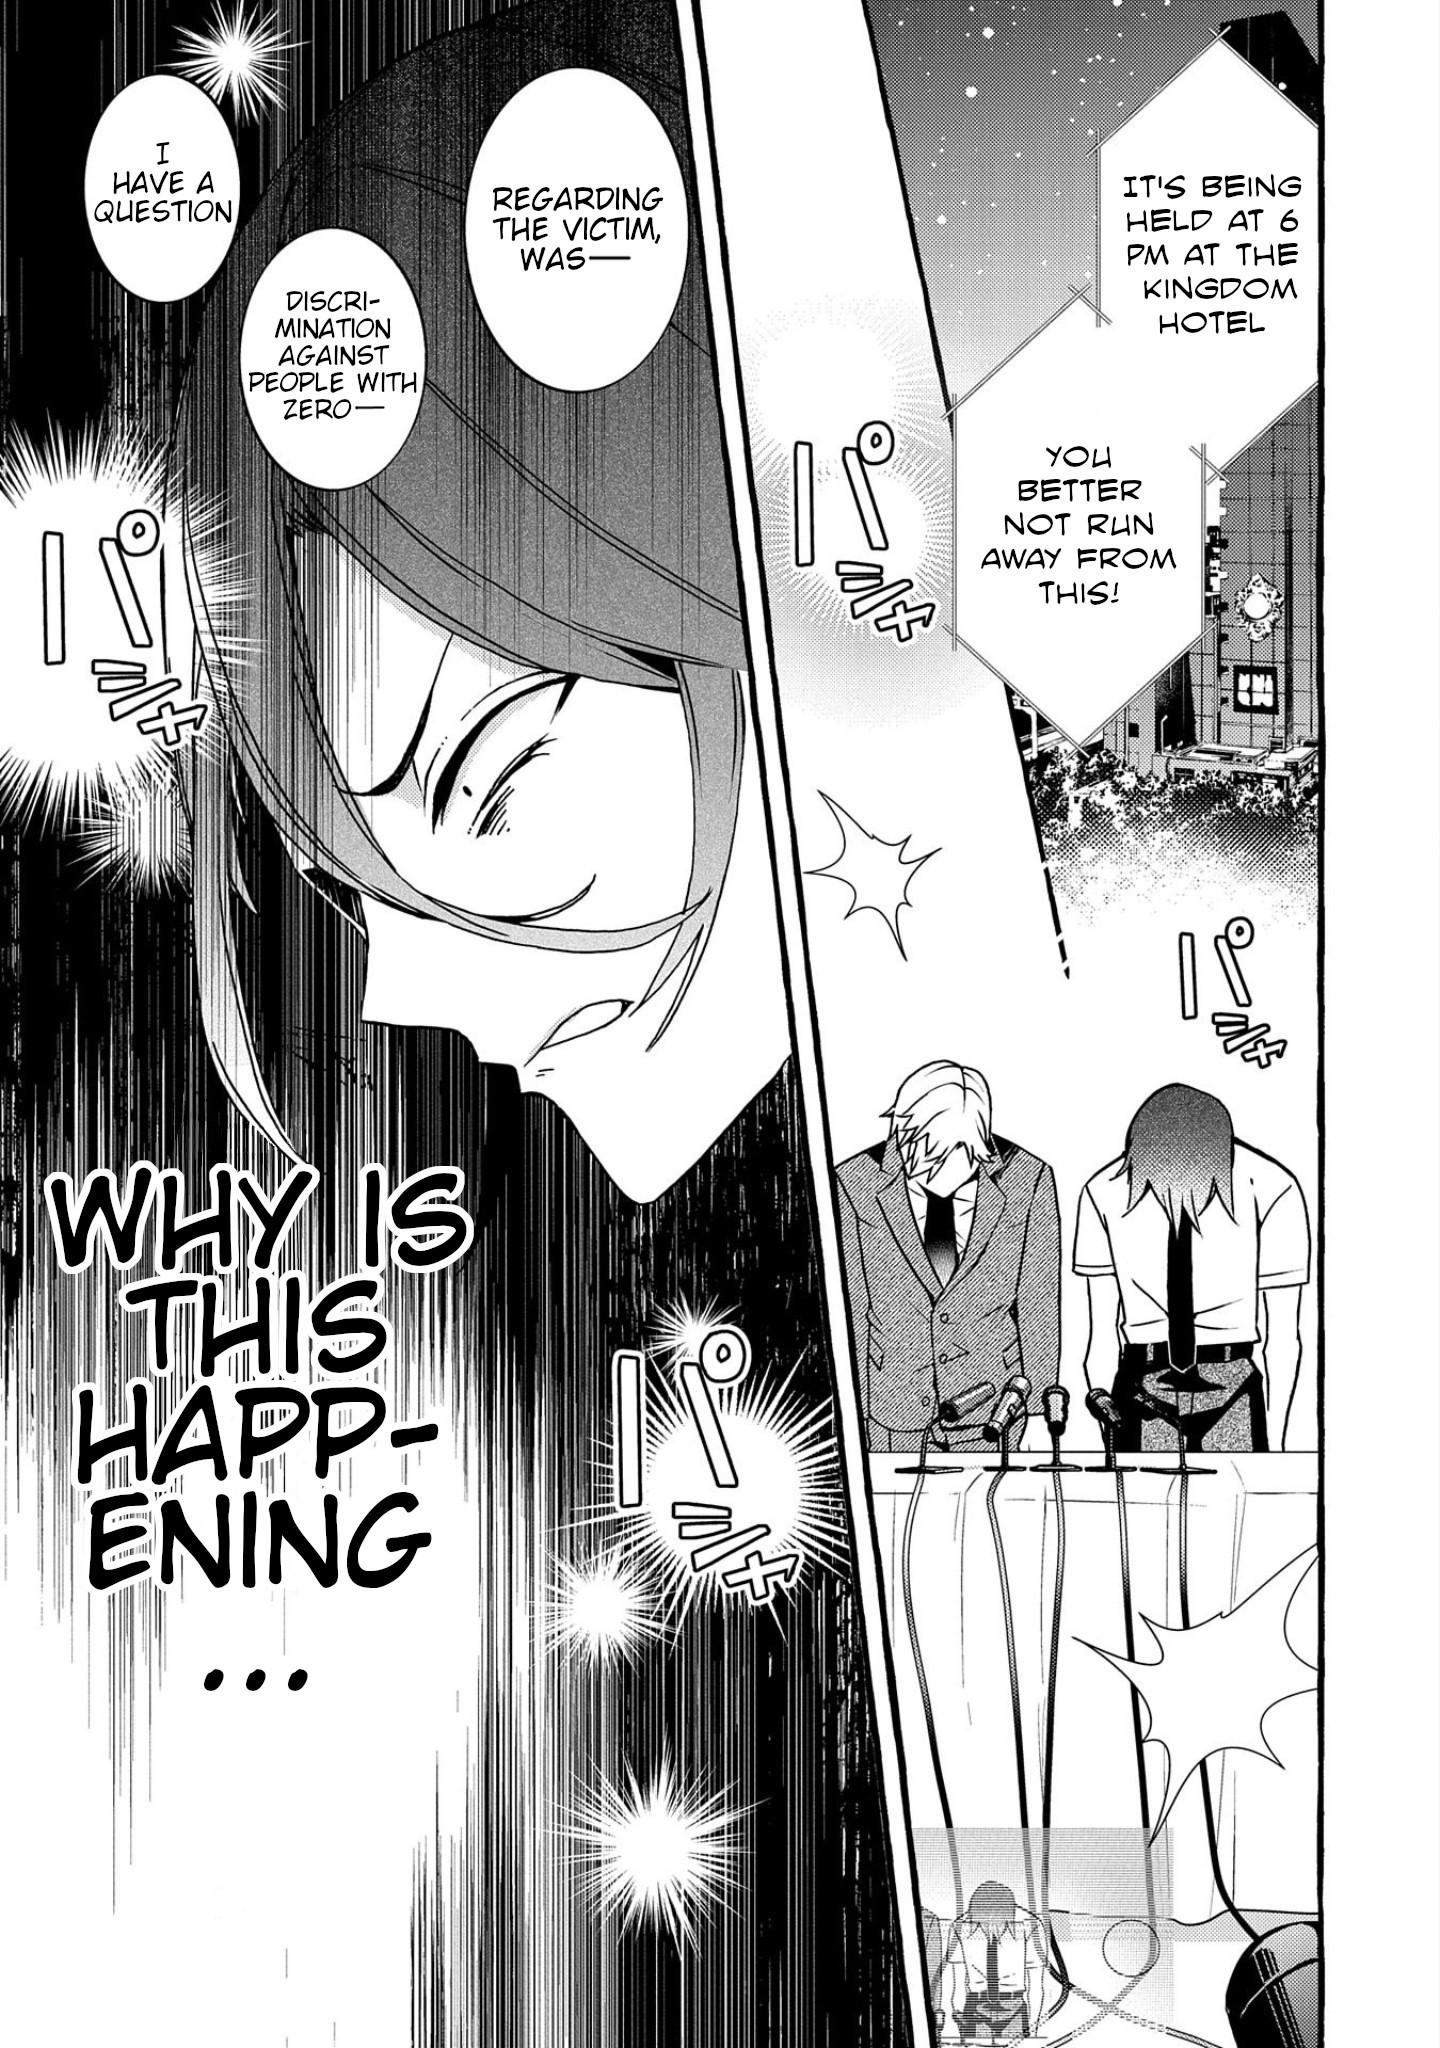 Kyuubo: Suterareteta Dragon Hirotta - chapter 3-eng-li